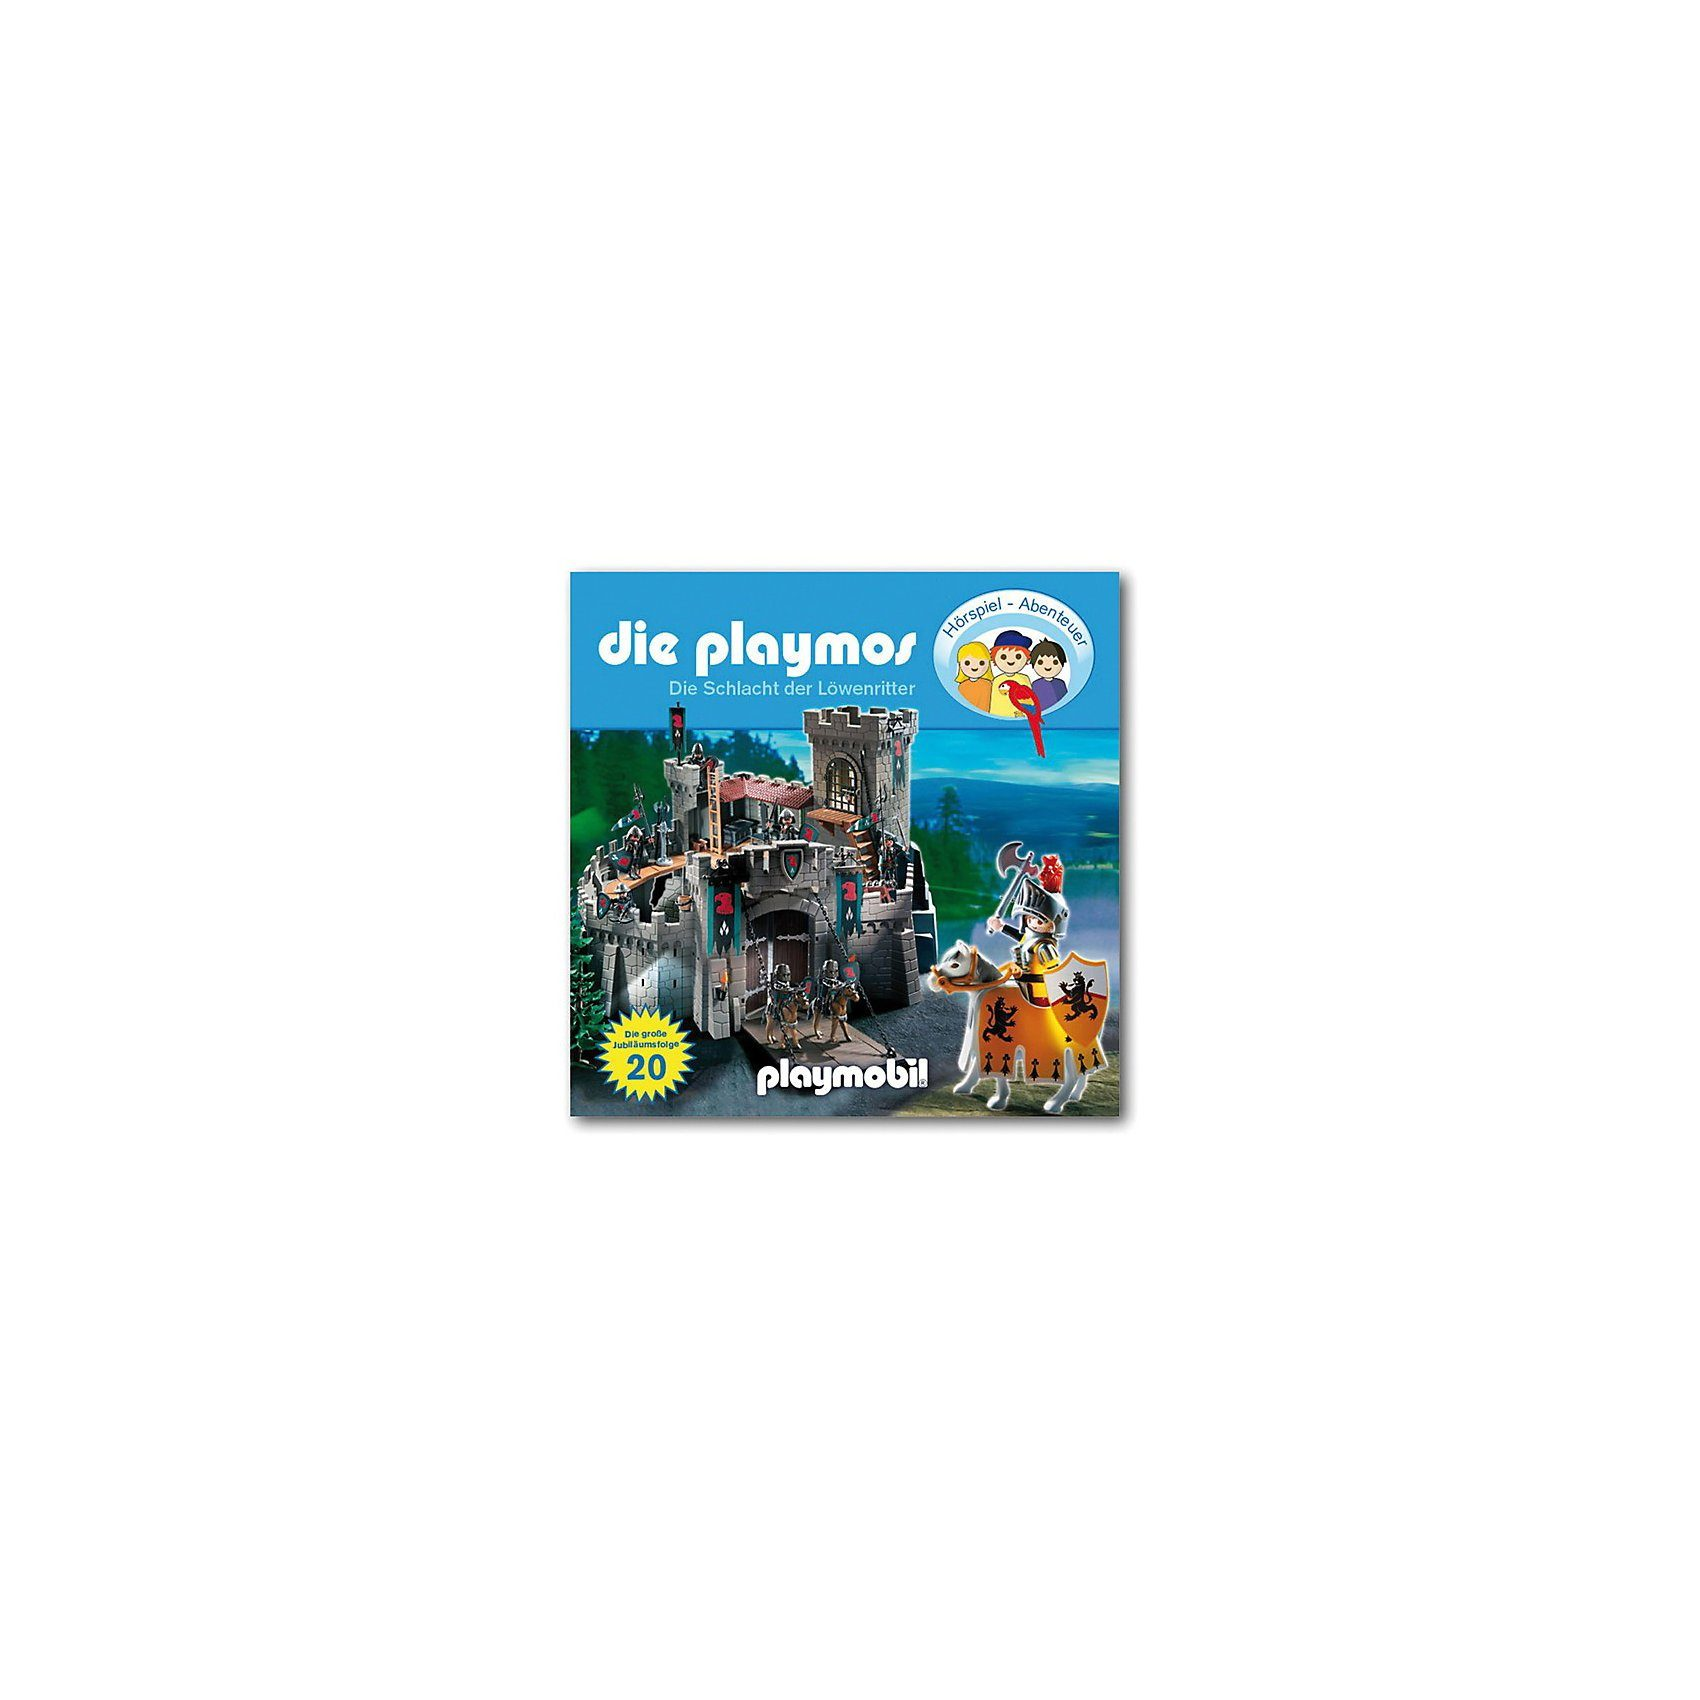 Edel Germany GmbH CD Die Playmos 20 - Die große Schlacht der Löwenritter